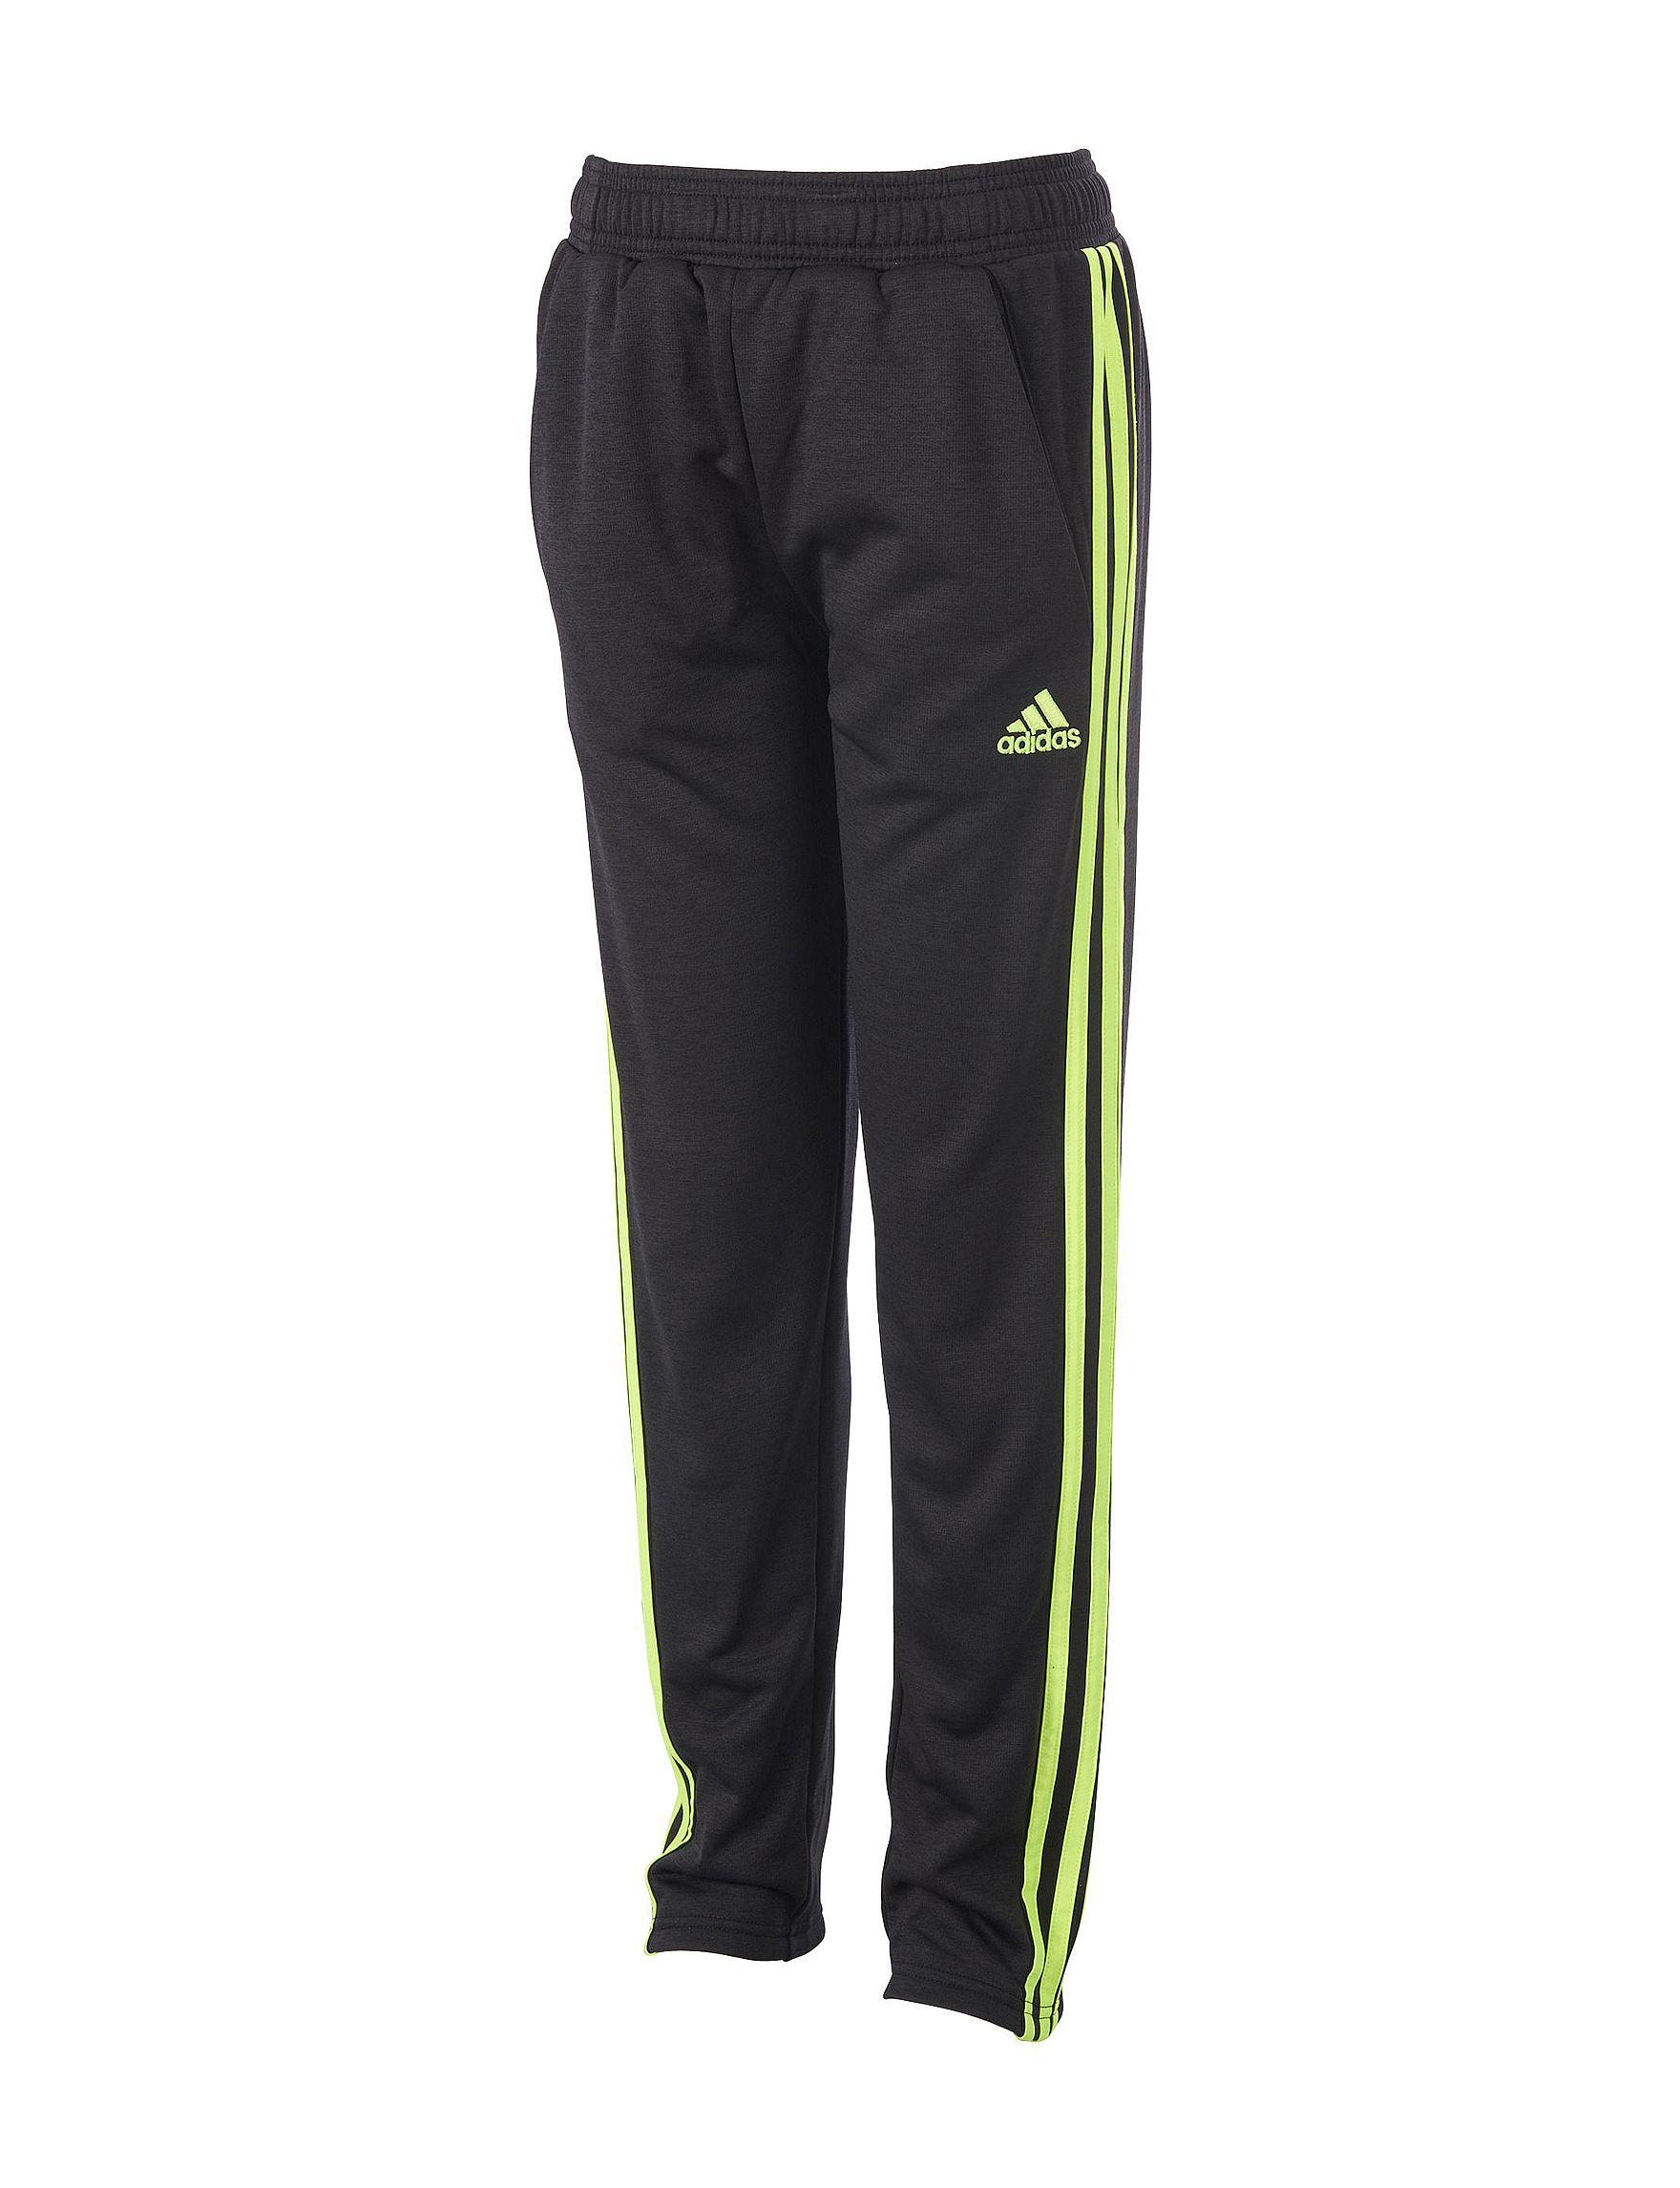 Adidas Black Soft Pants